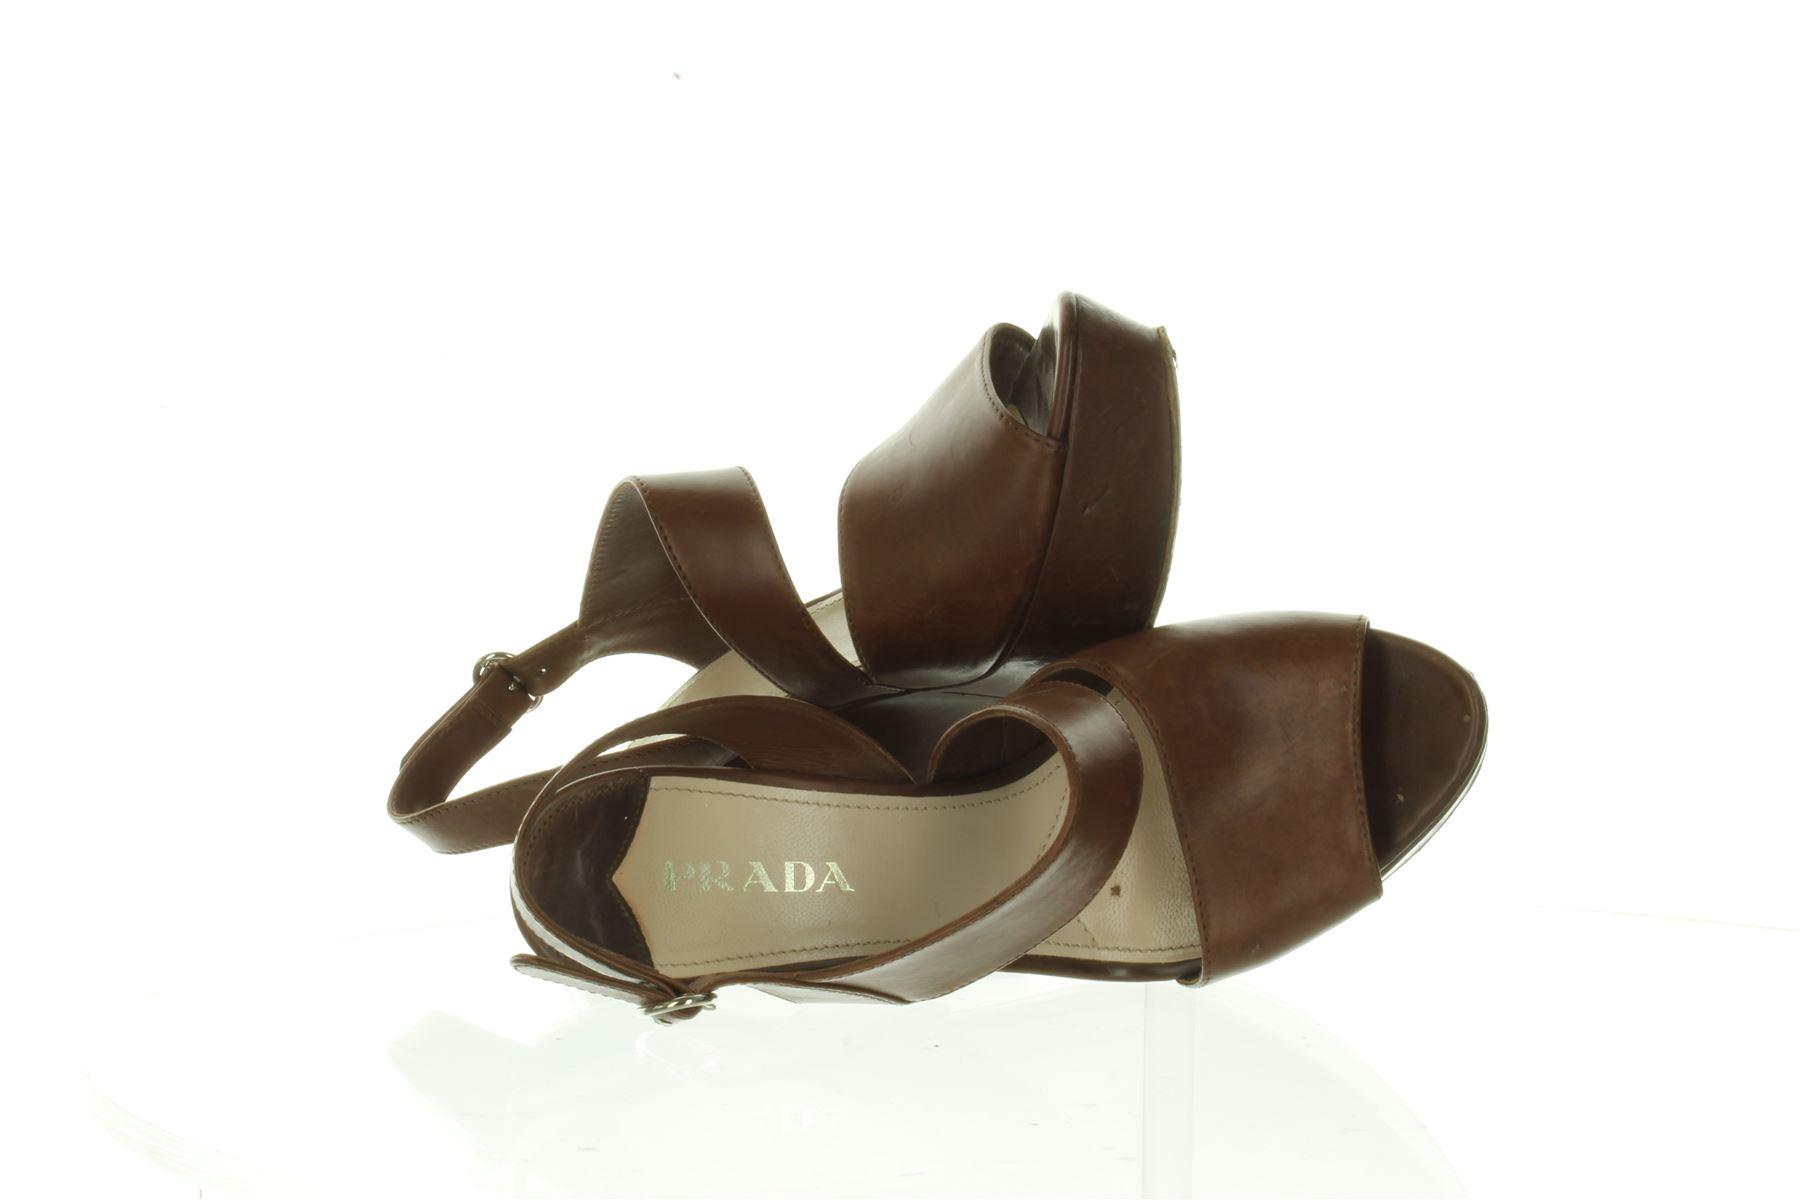 PRADA Braun Leder Wedge Schuhes, UK 4.5 US 7.5 7.5 7.5 EU 37.5 cd29e5